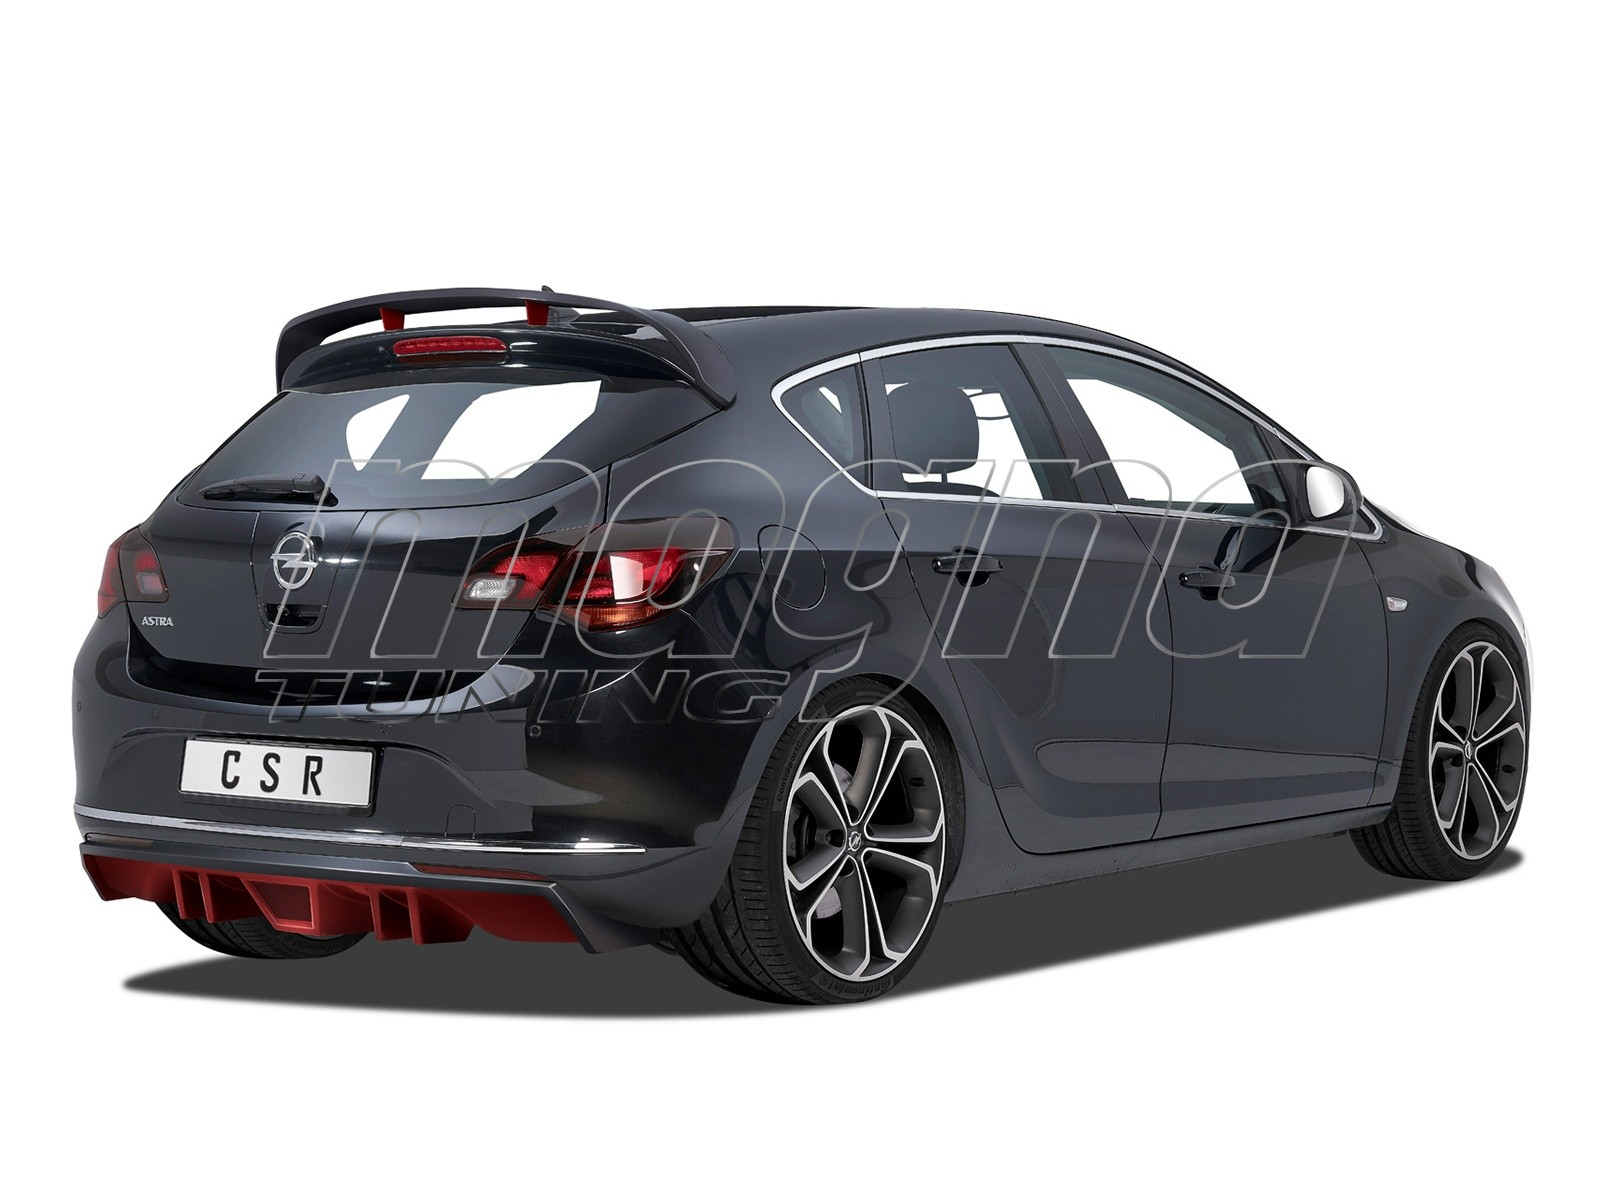 Opel Astra J Cyber Hatso Lokharito Toldat